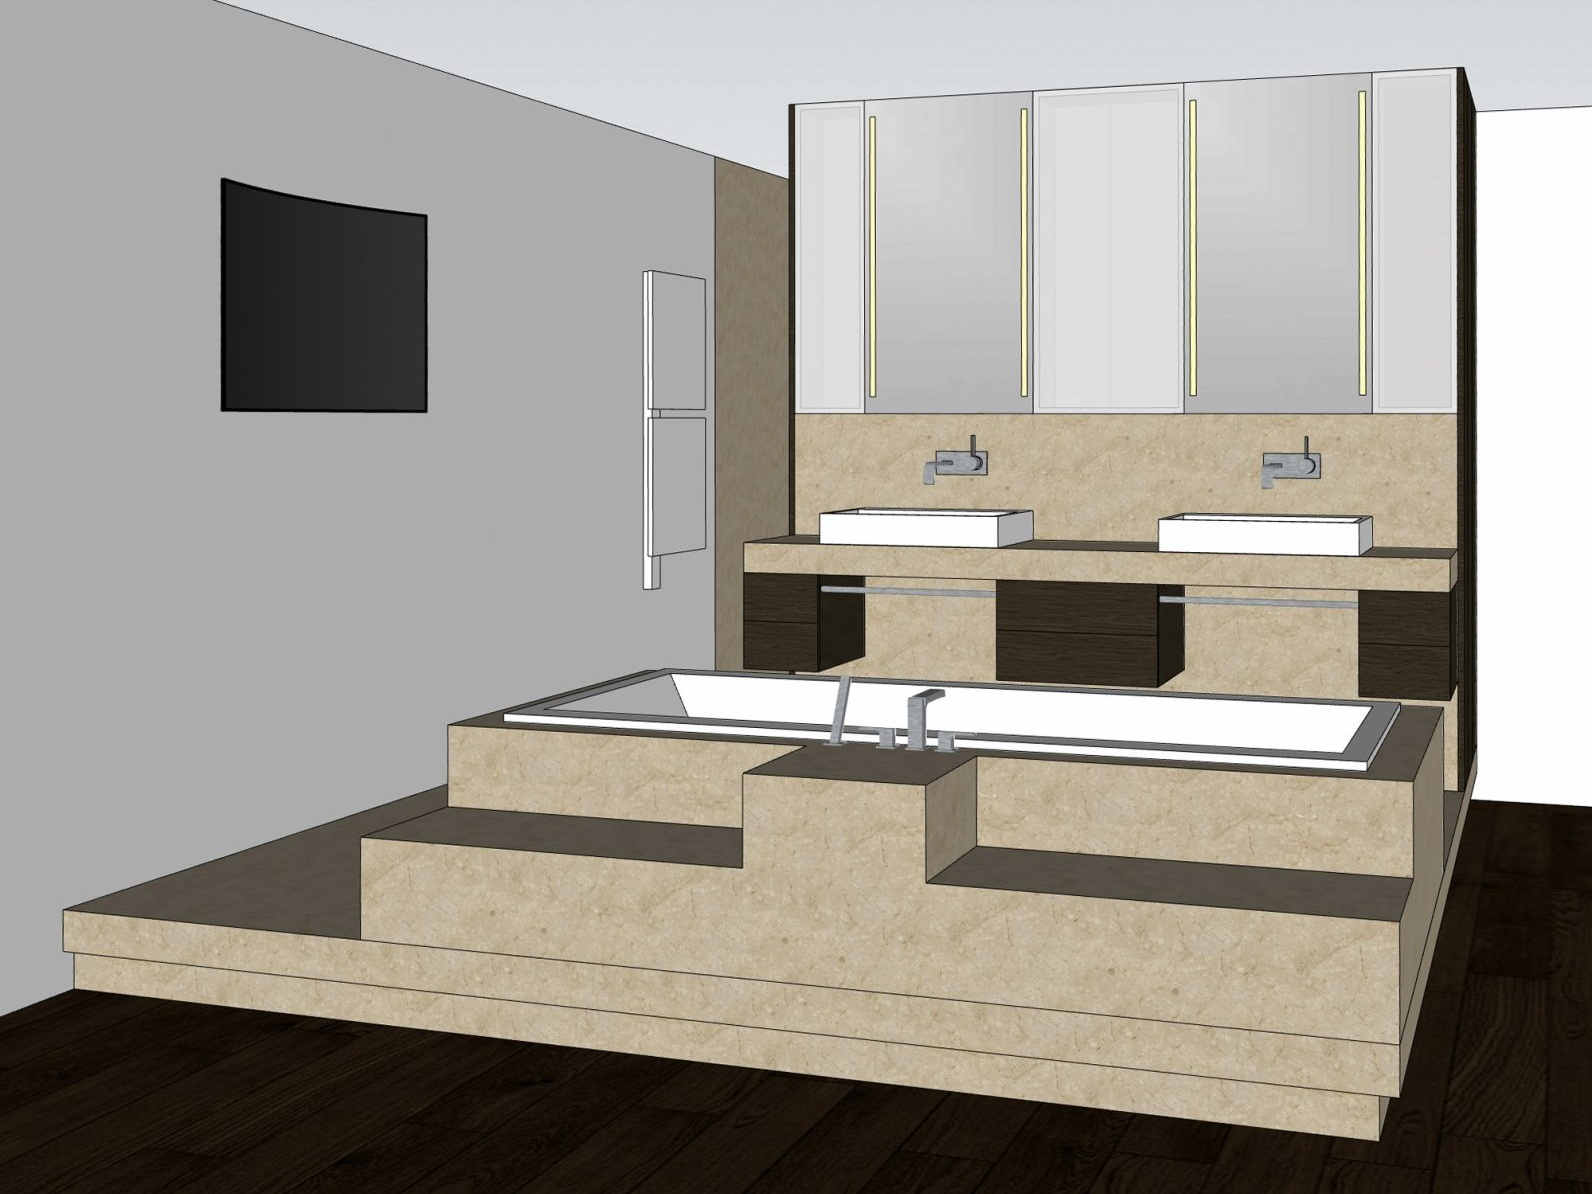 Luxusbad im Penthouse - Visualisierung